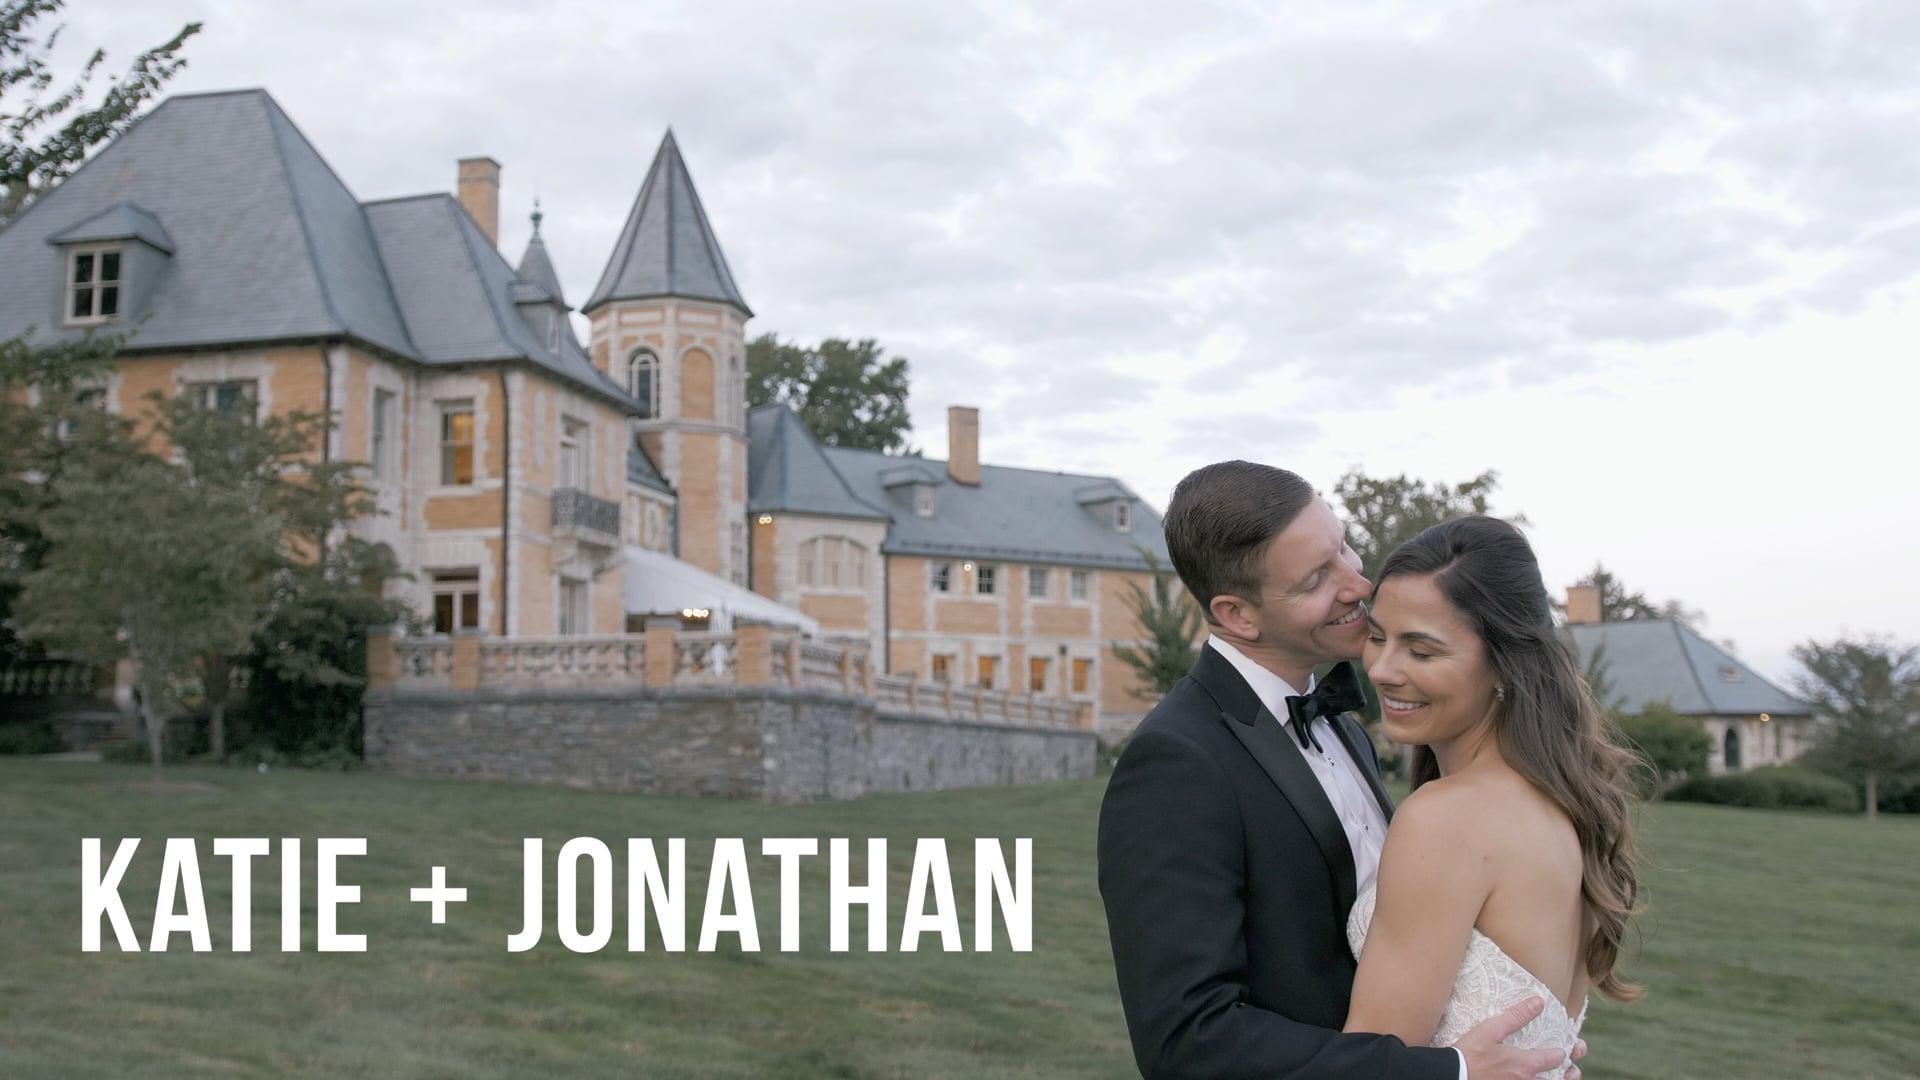 Katie + Jonathan - 8.24.19